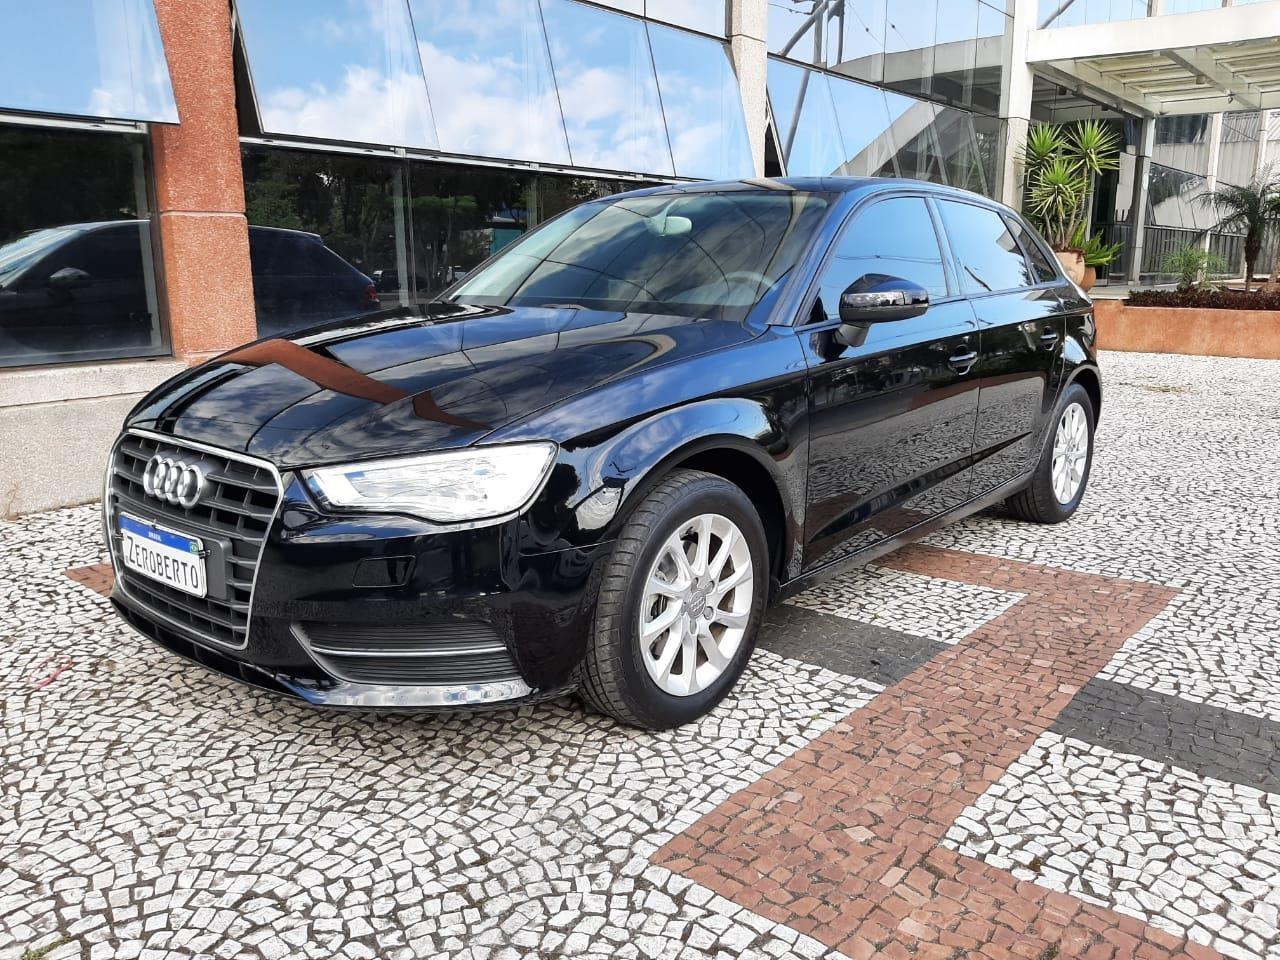 //www.autoline.com.br/carro/audi/a3-14-sportback-tfsi-16v-gasolina-4p-turbo-s-tro/2014/santo-andre-sp/15142232